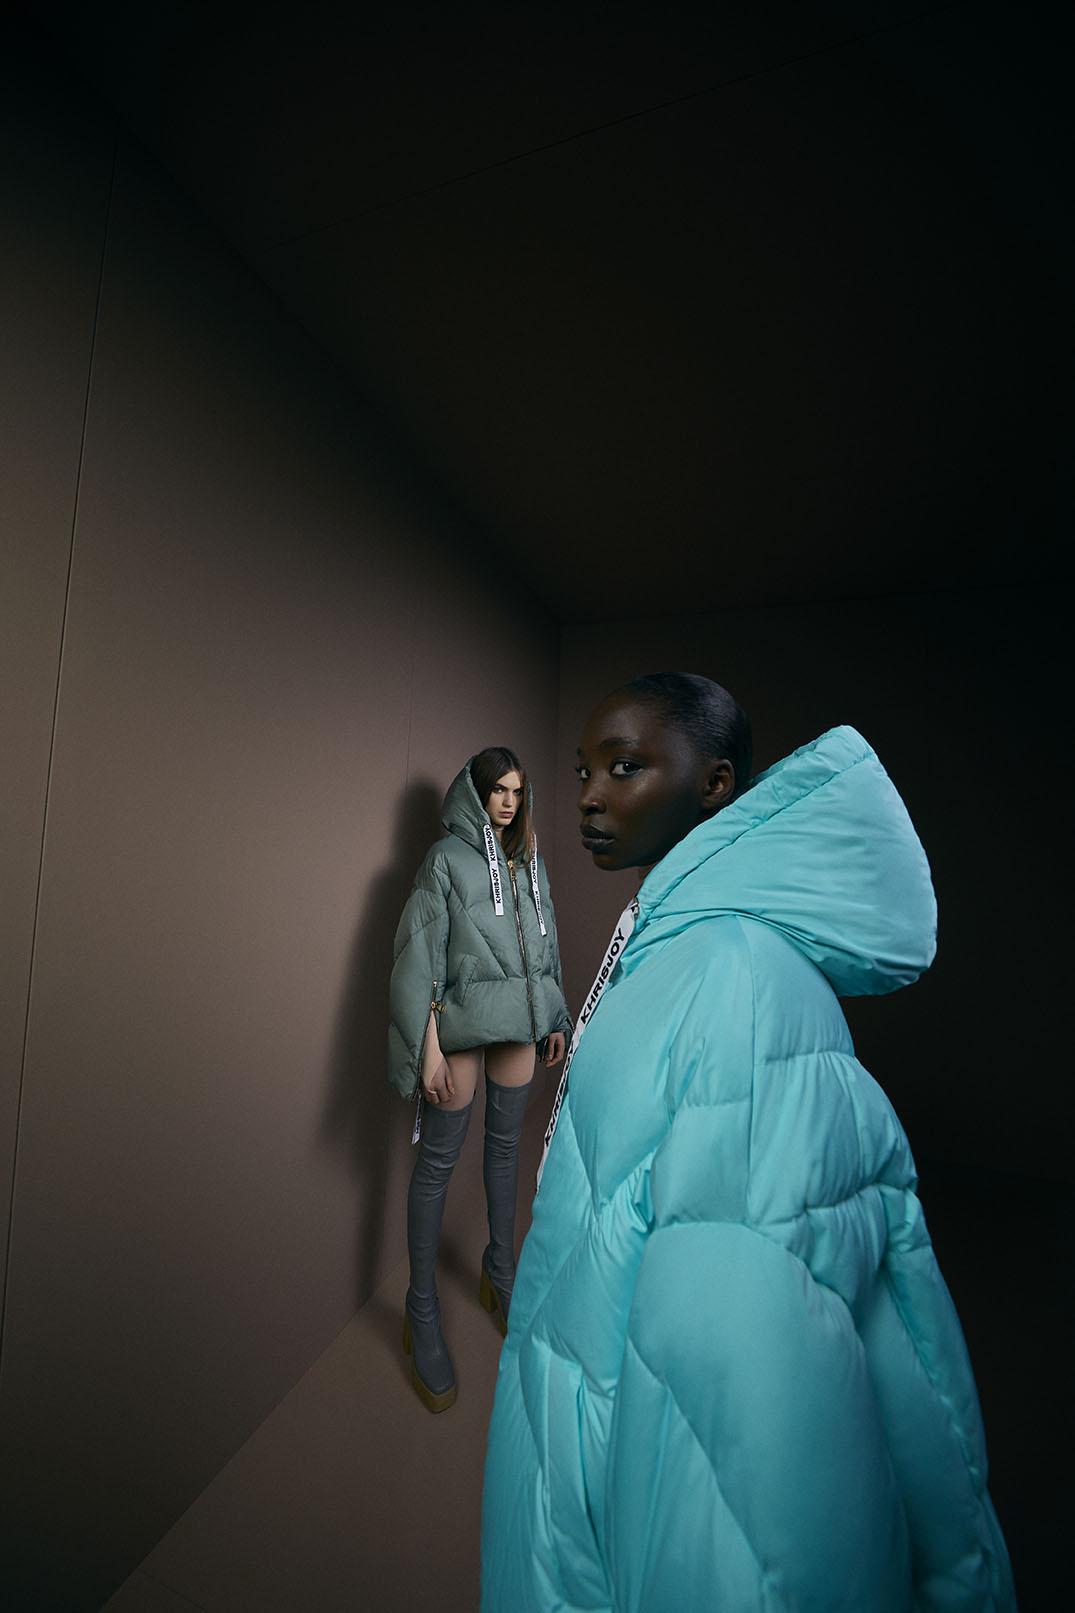 Khrisjoy Pre-Fall 21 collection | Riccardo Dubitante | Khrisjoy | Ramona Tabita | Numerique Retouch Photo Retouching Studio